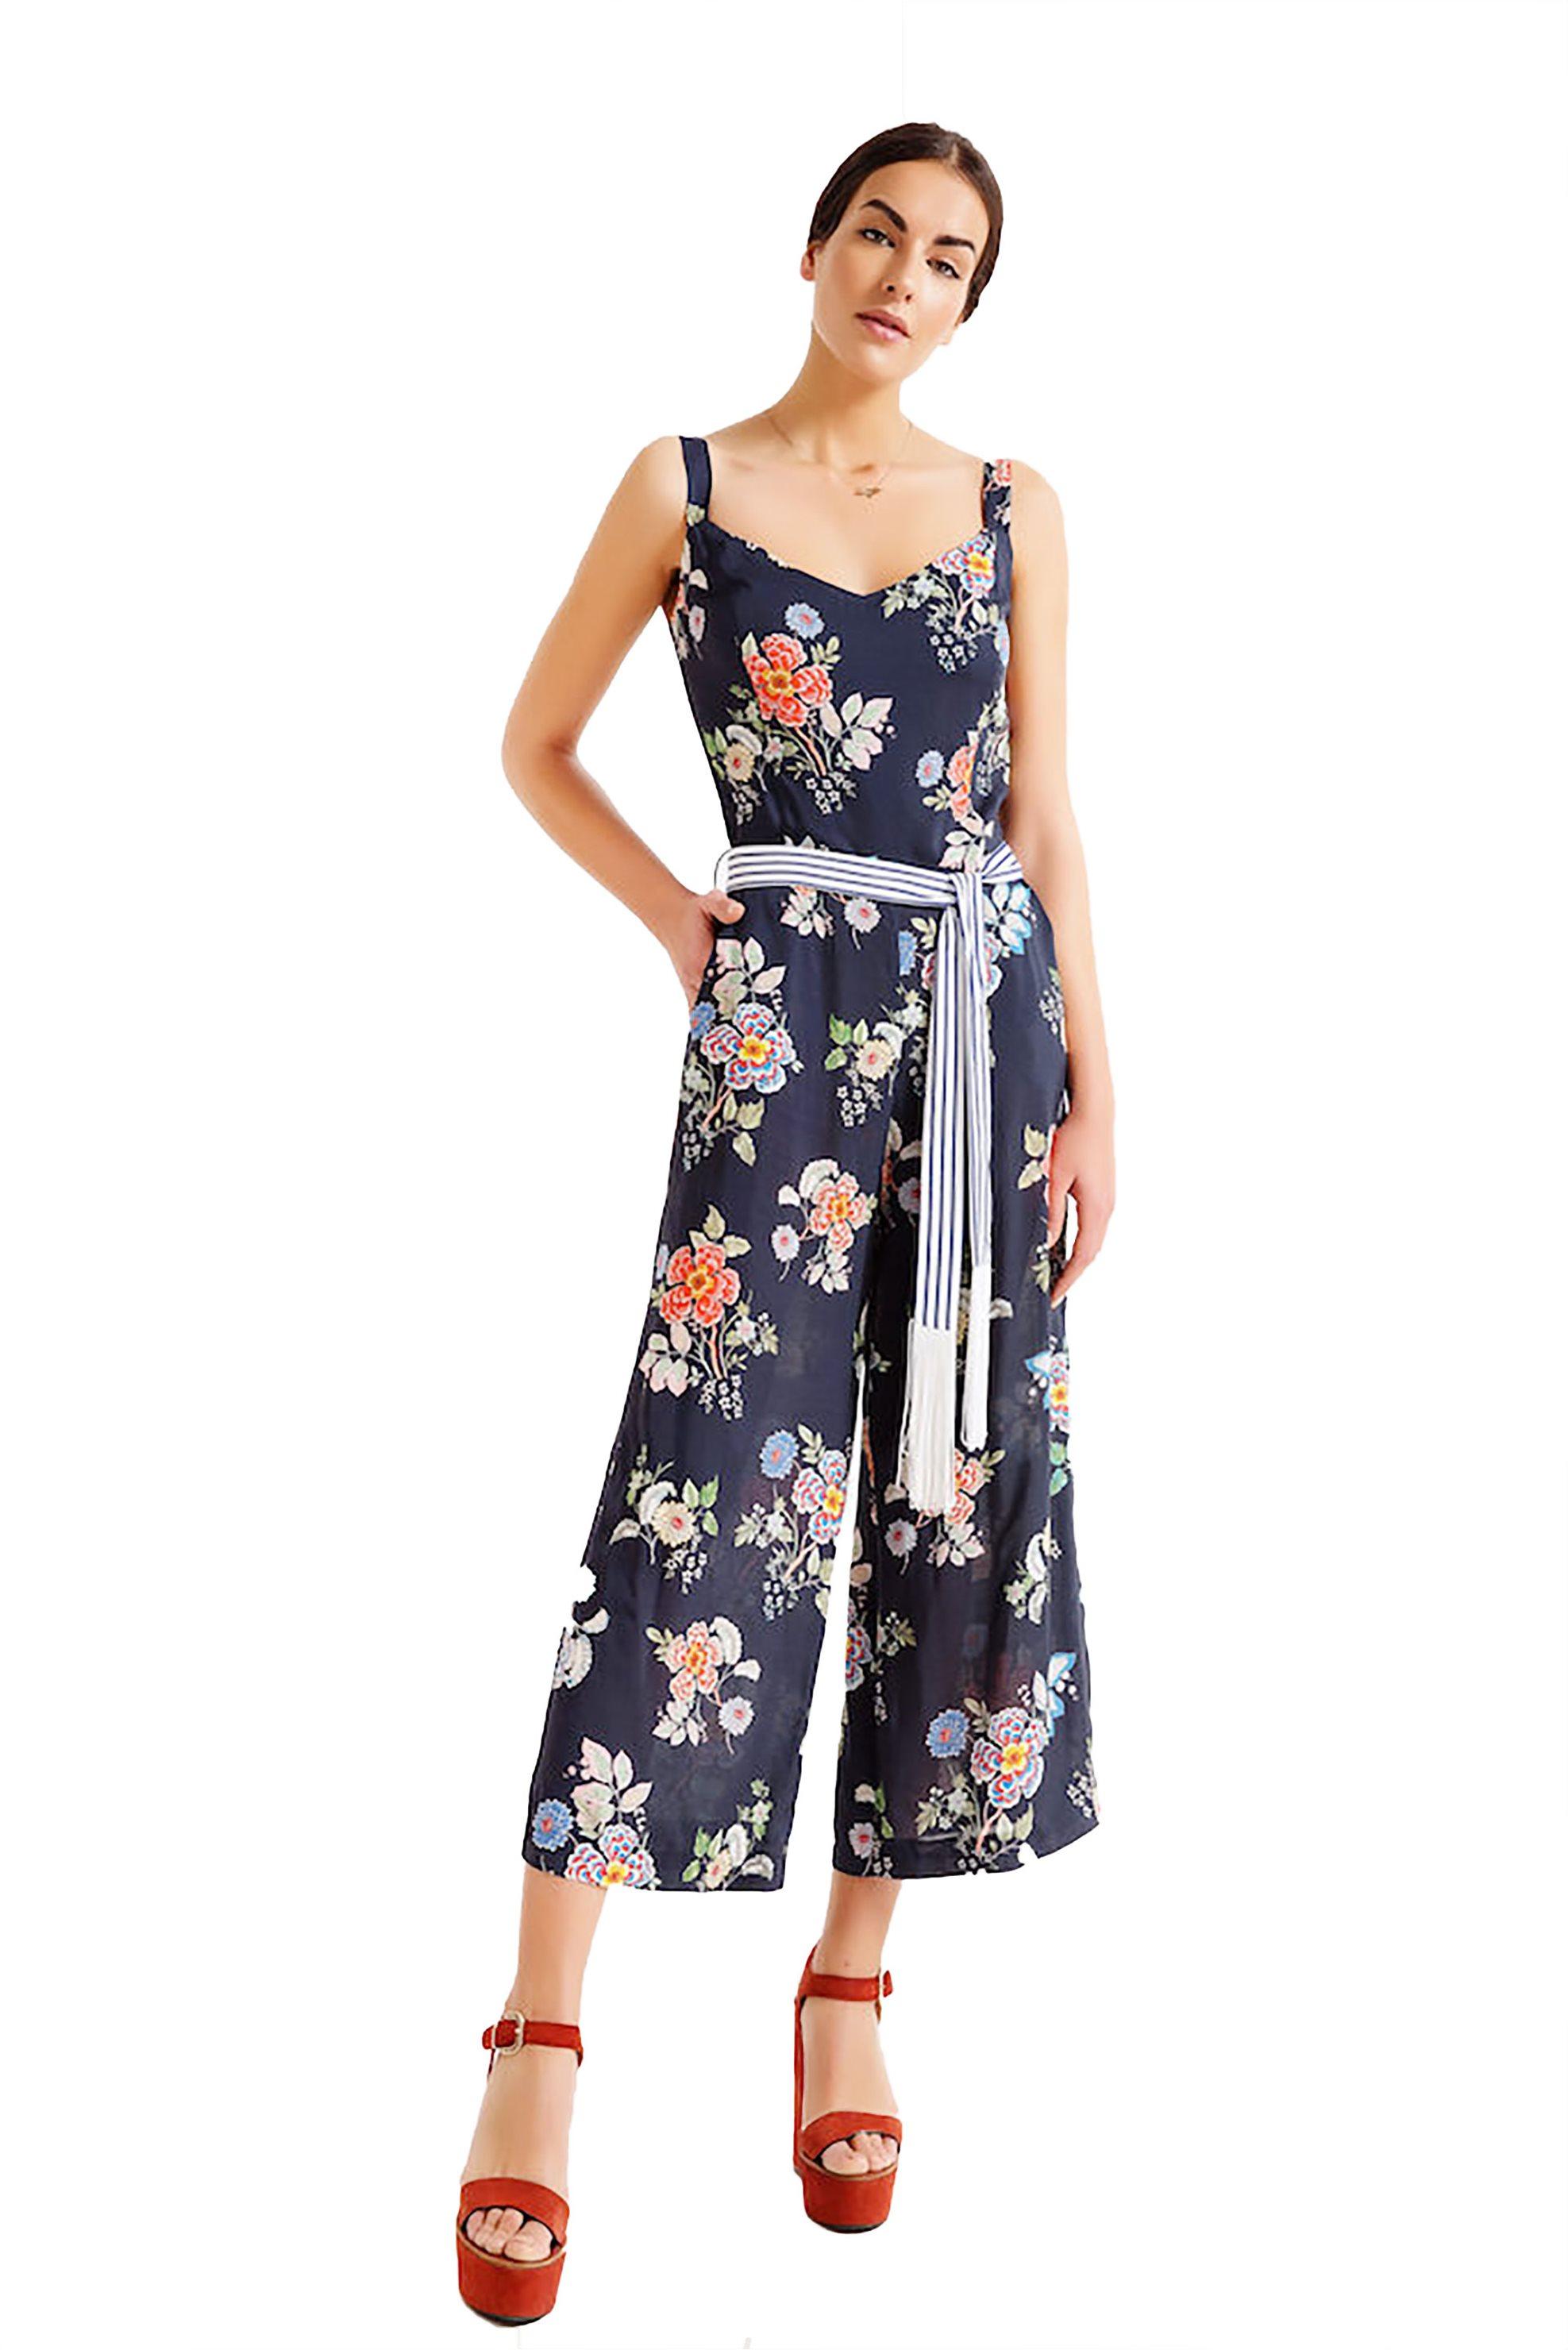 478cdeb681e5 Update   Γυναικείο κοντομάνικο φόρεμα σε γραμμή Α με μικροσχέδιο ...